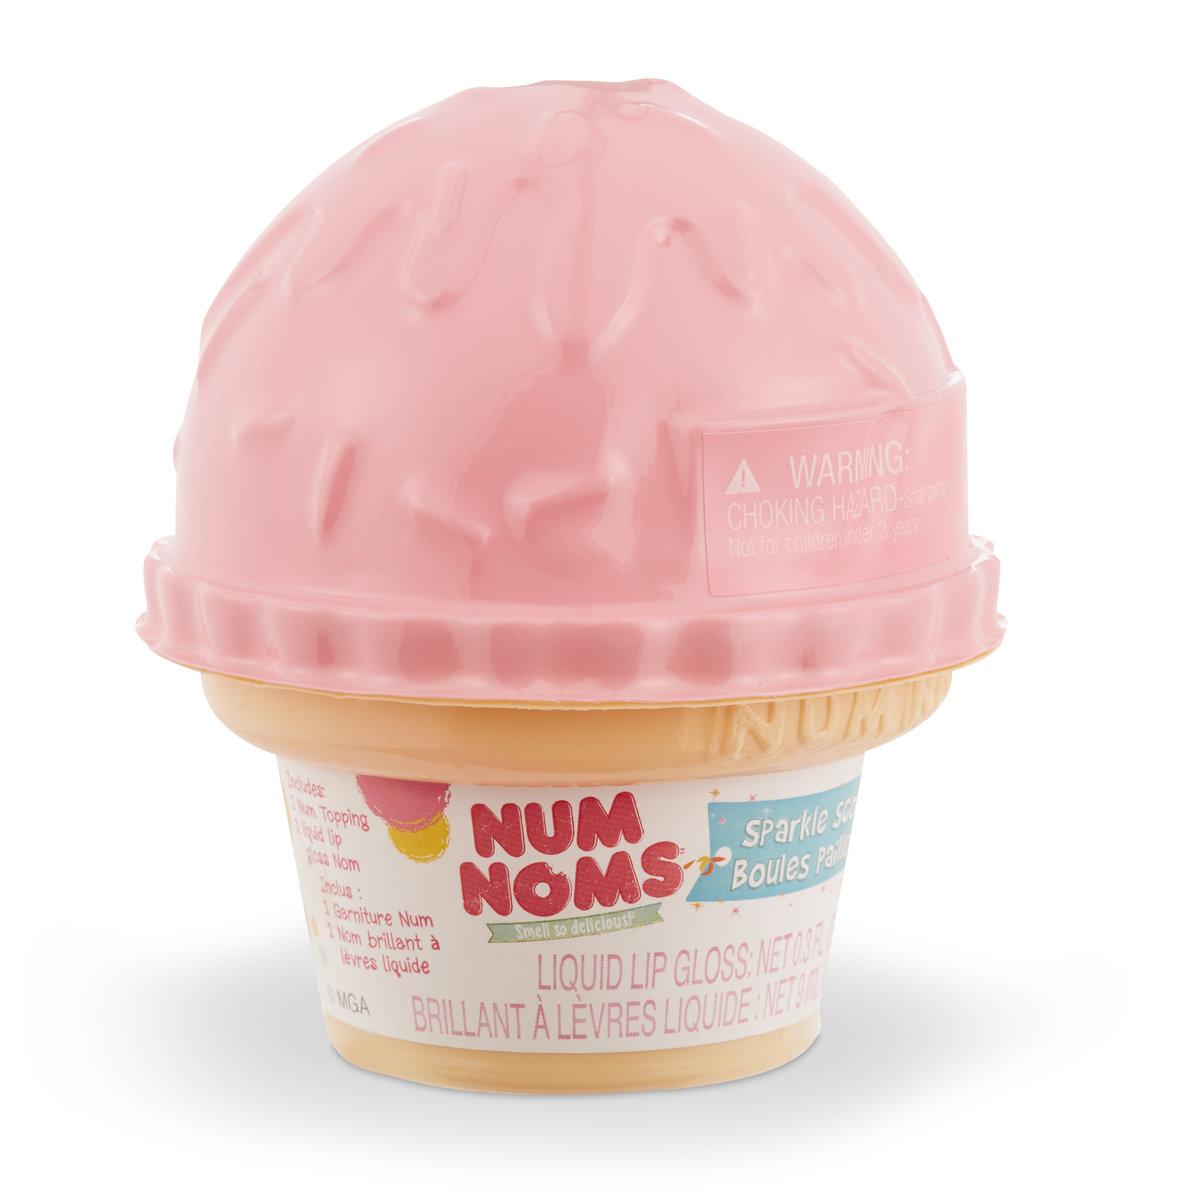 Num Noms 雪糕球唇彩套裝 [隨機發送]